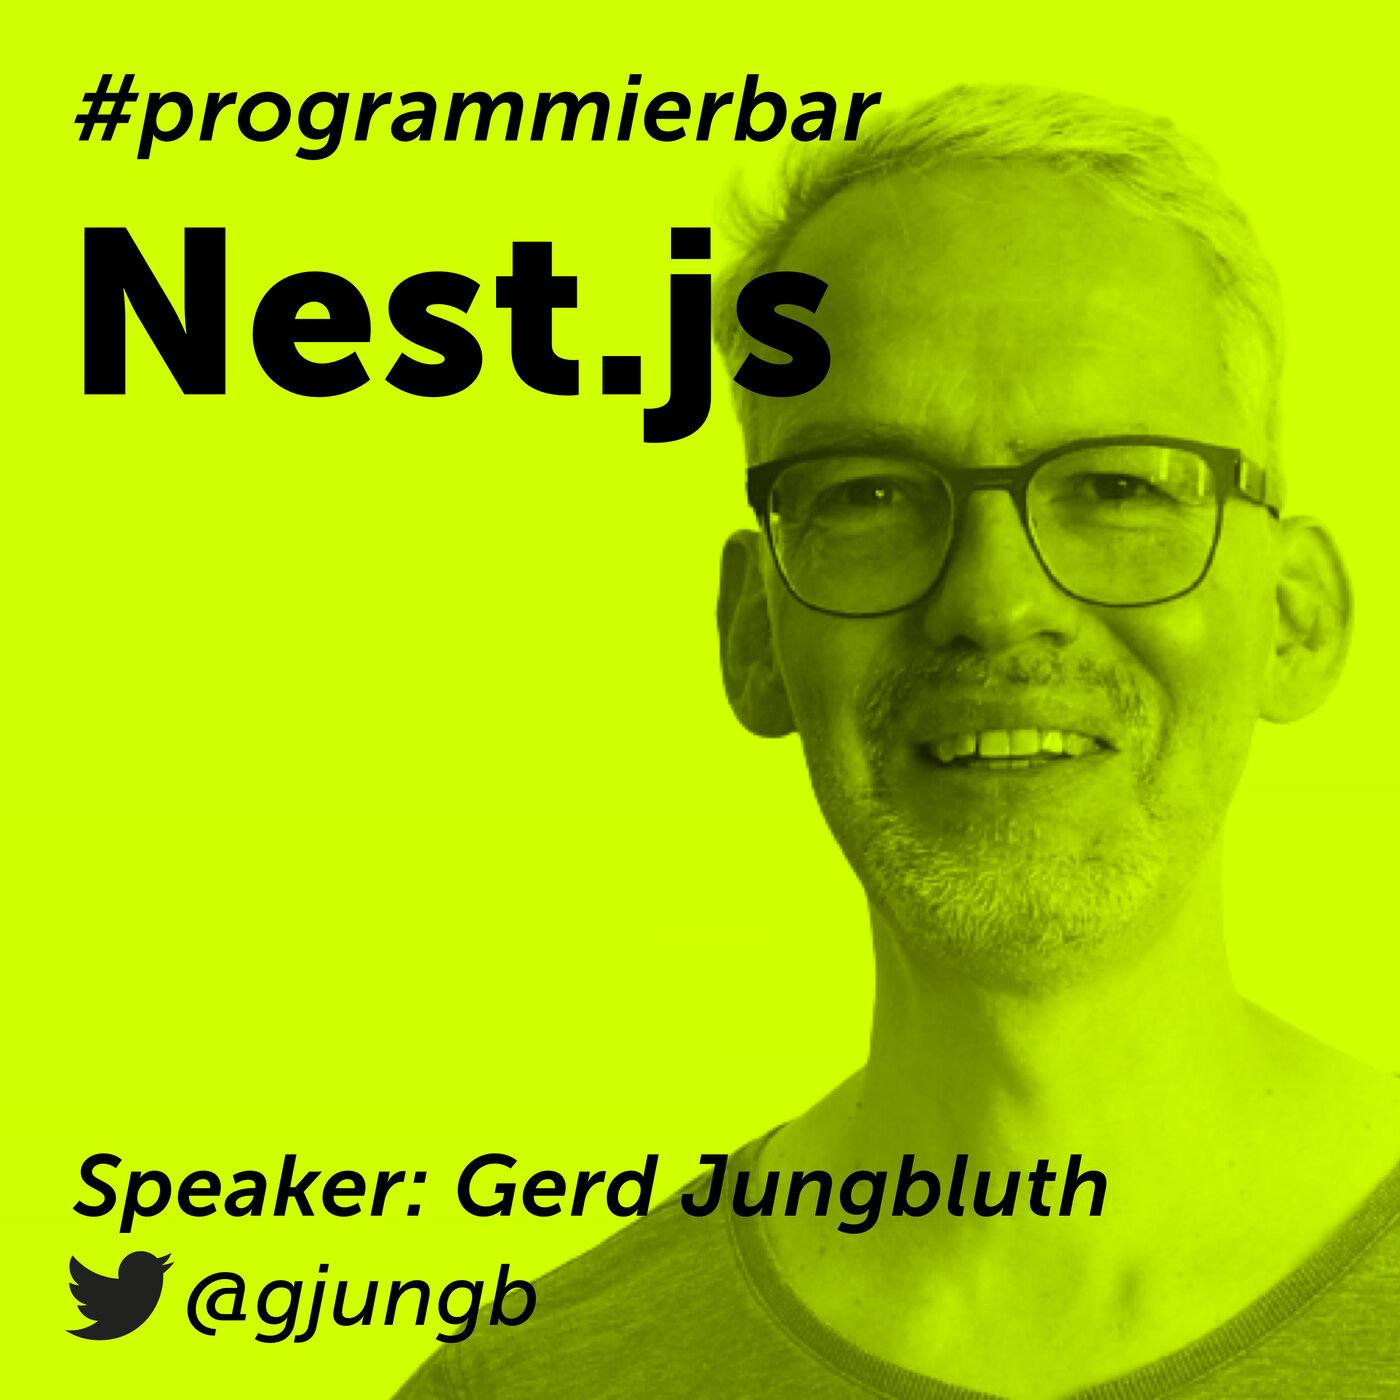 Folge 71 - NestJS mit Gerd Jungbluth